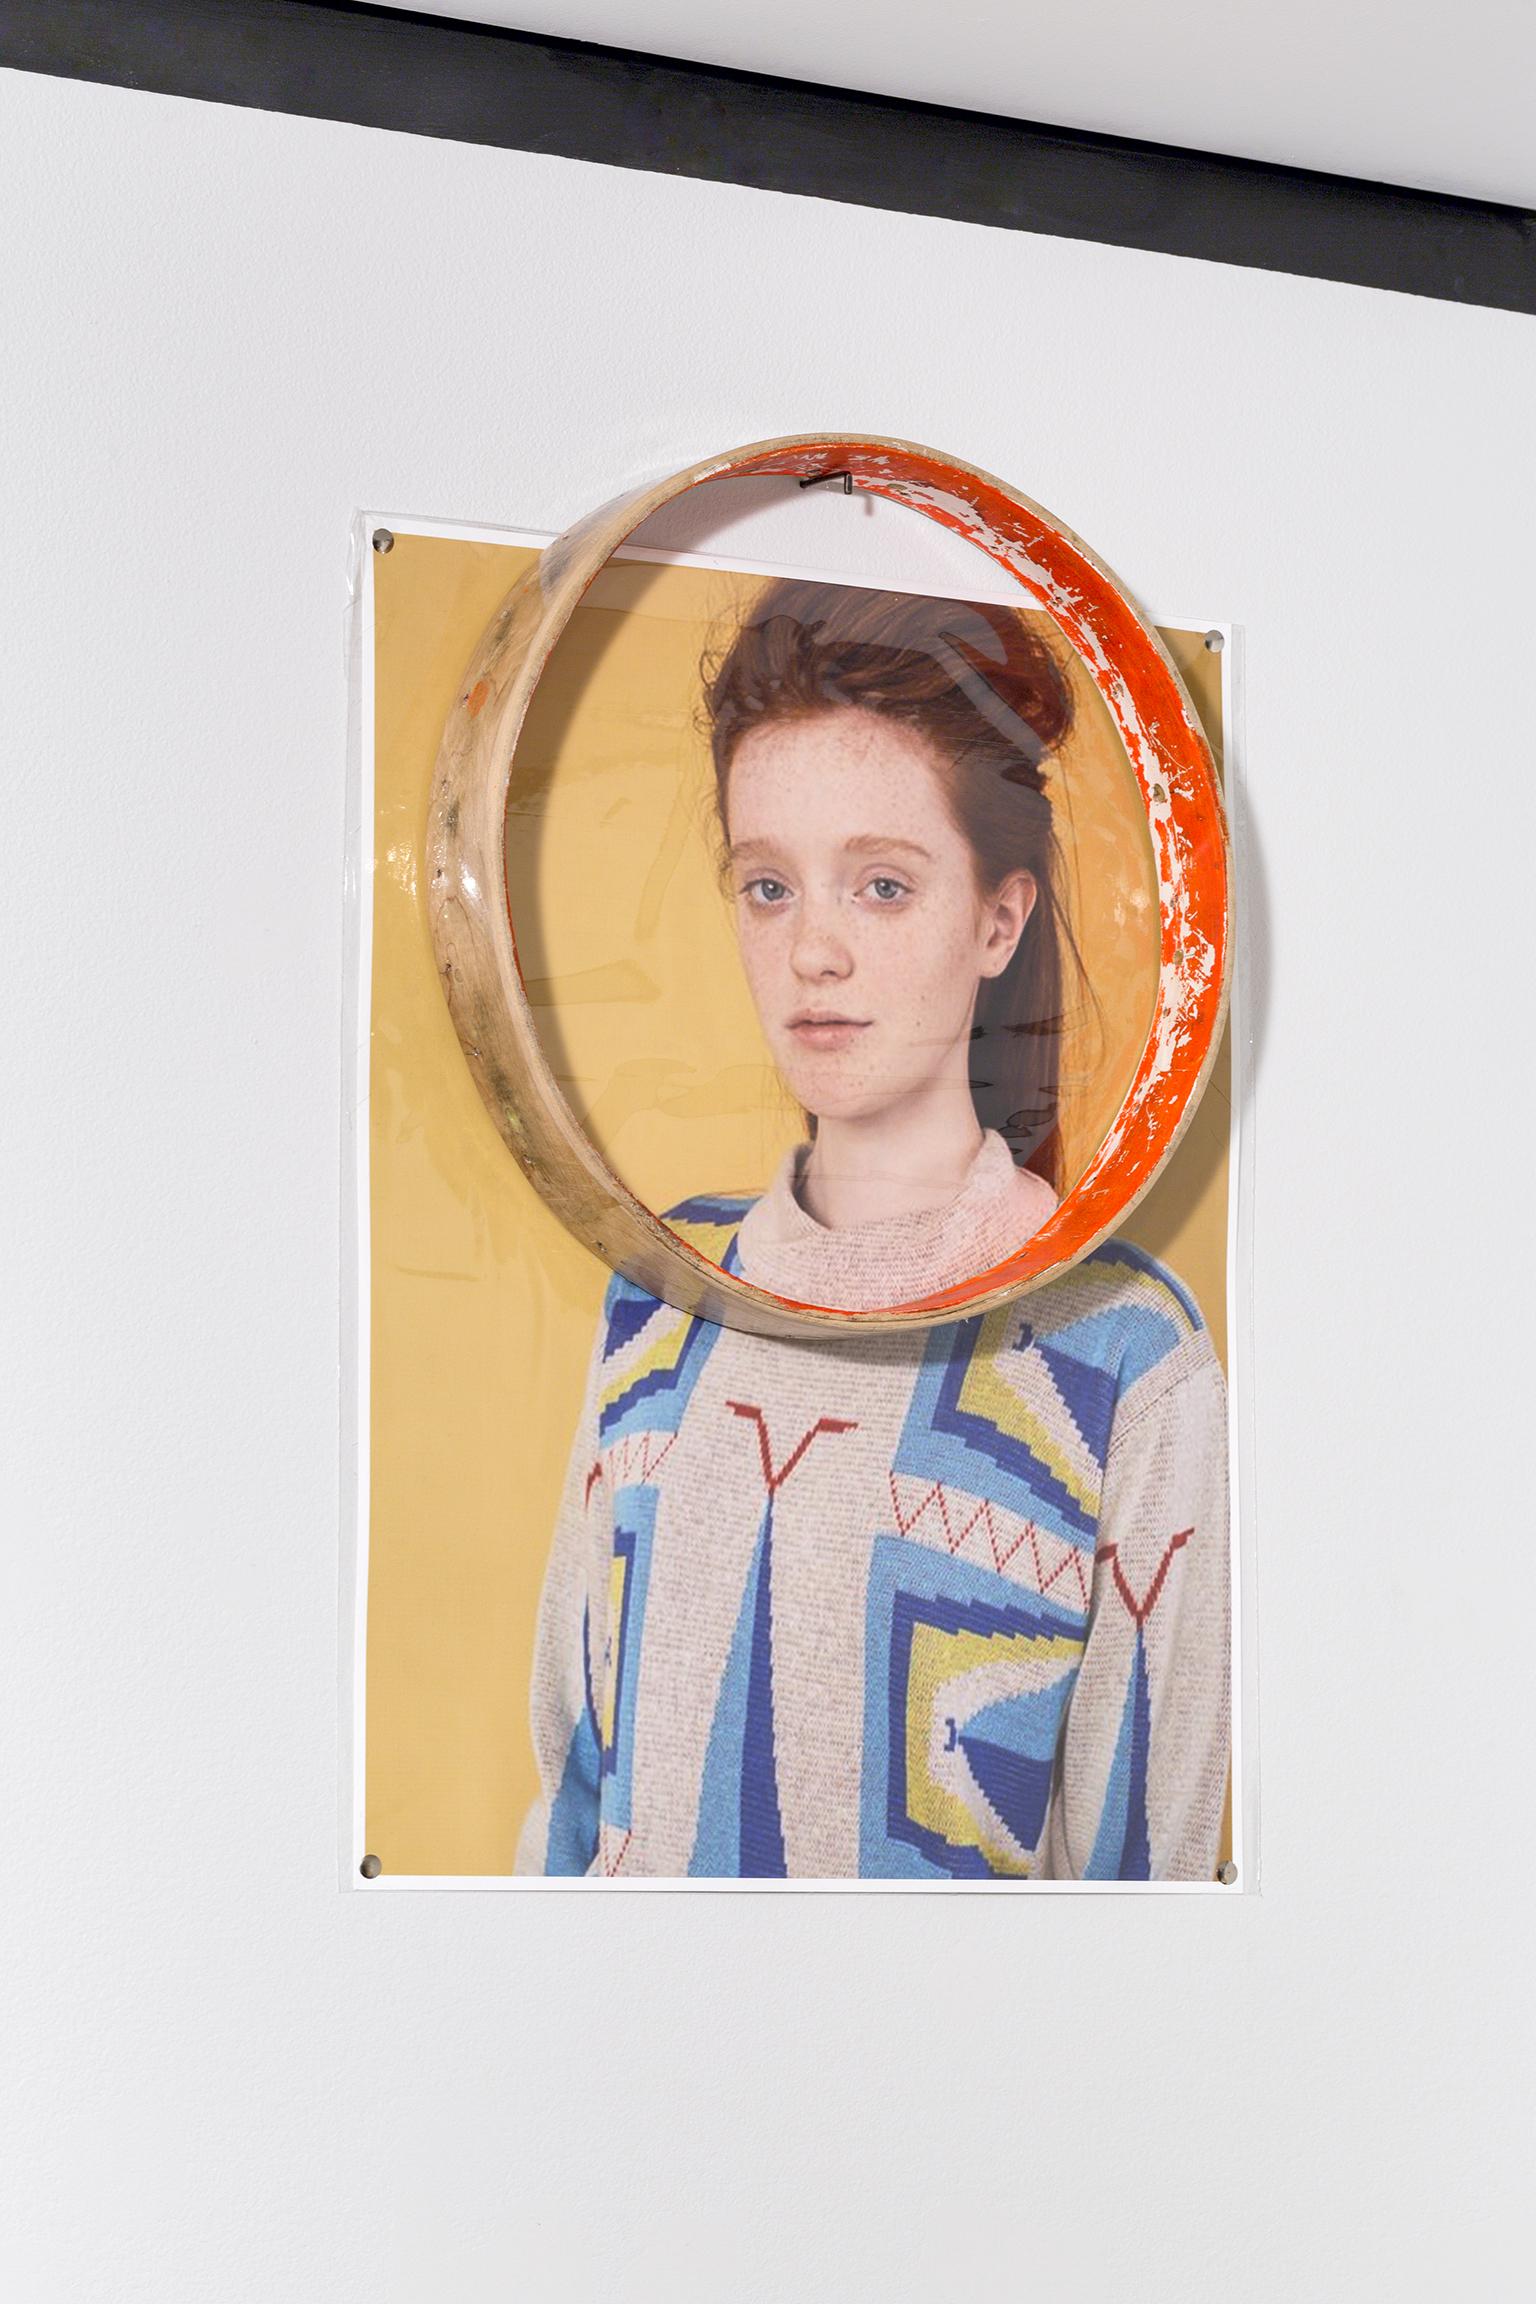 Duane Linklater, A Sort of Naiveté 2, 2016, 4 digital prints on archival paper, push pins, drum rim, each 23 x 17 in. (58 x 43 cm) by